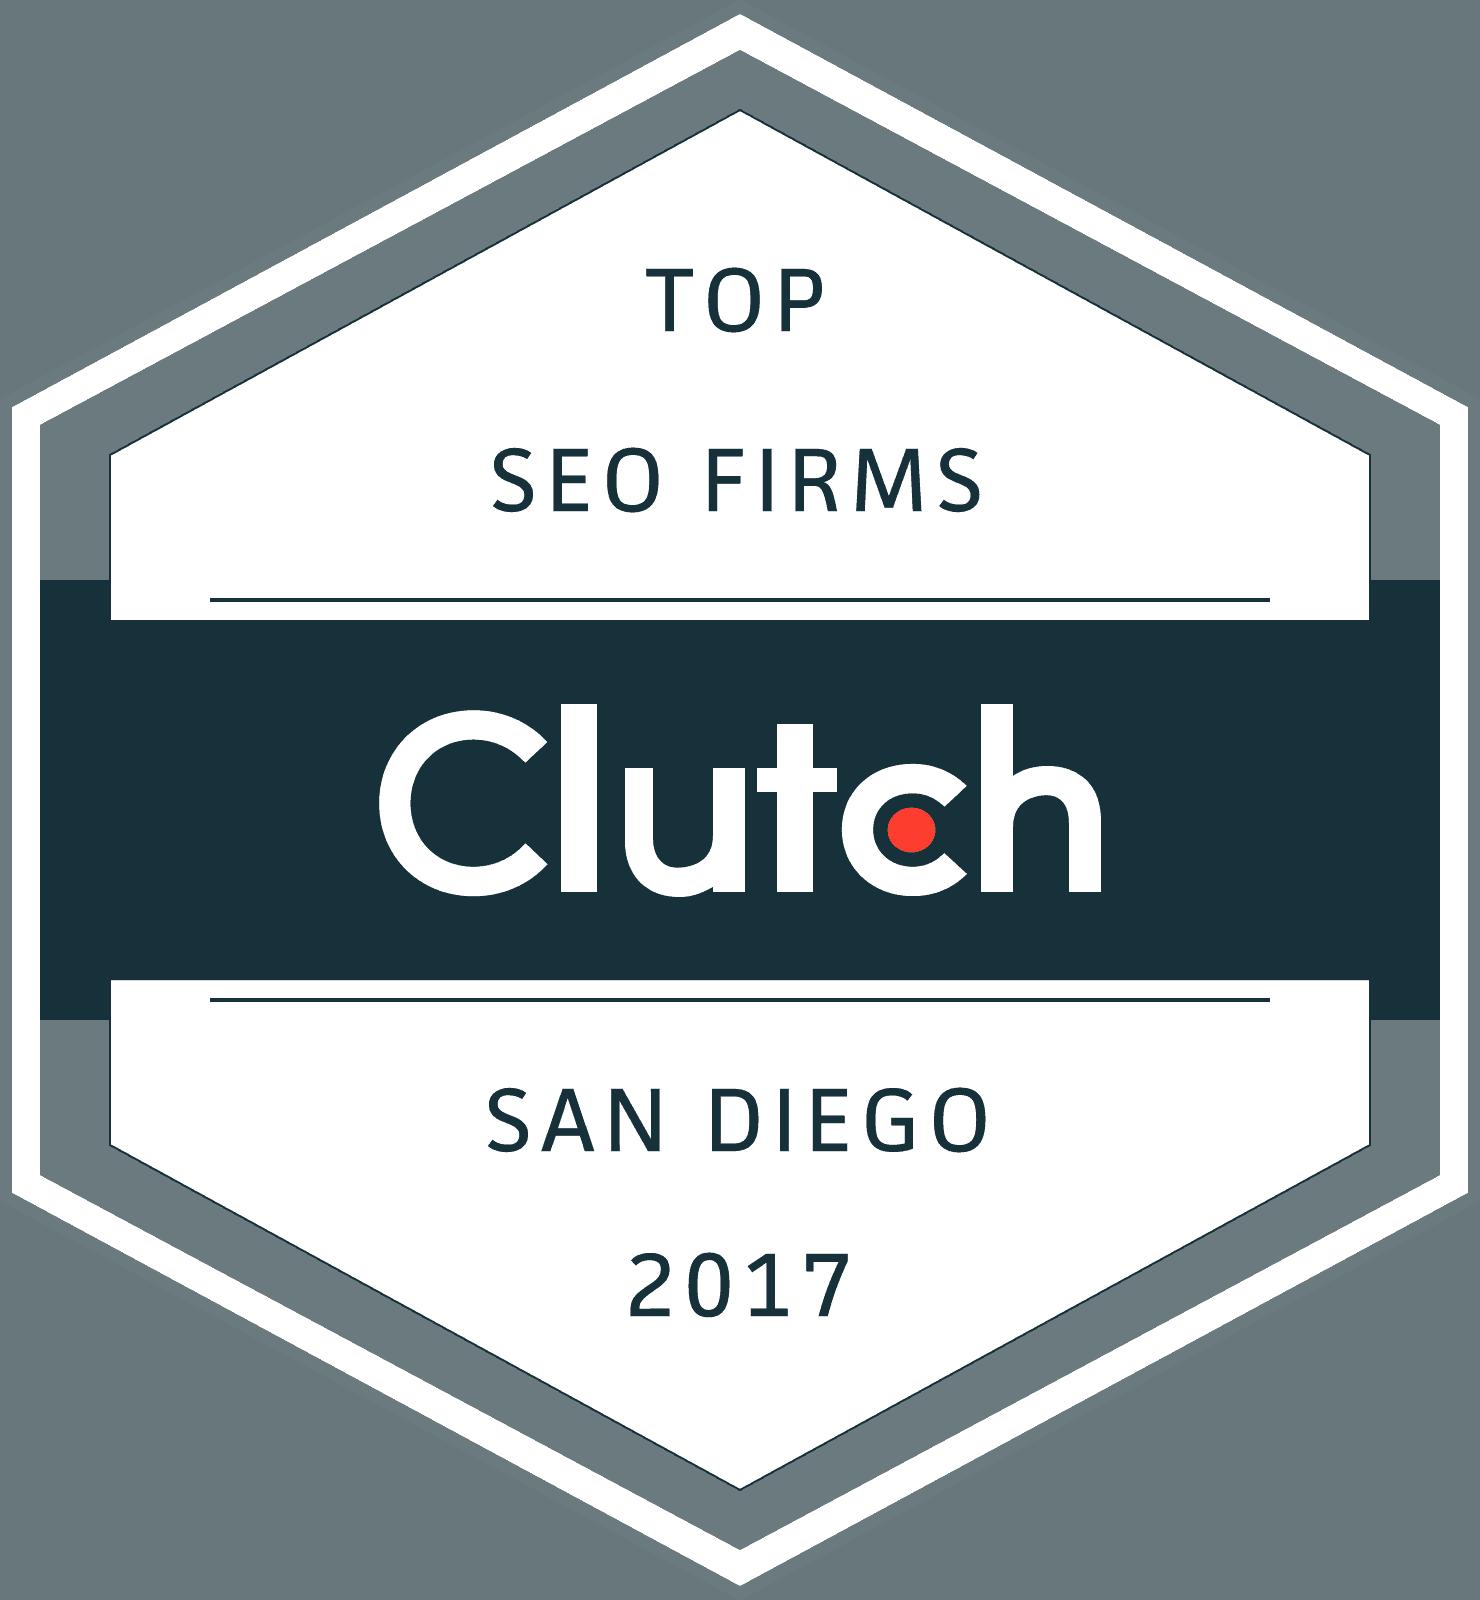 Clutch.co Top SEO Firm in San Diego Award 2017